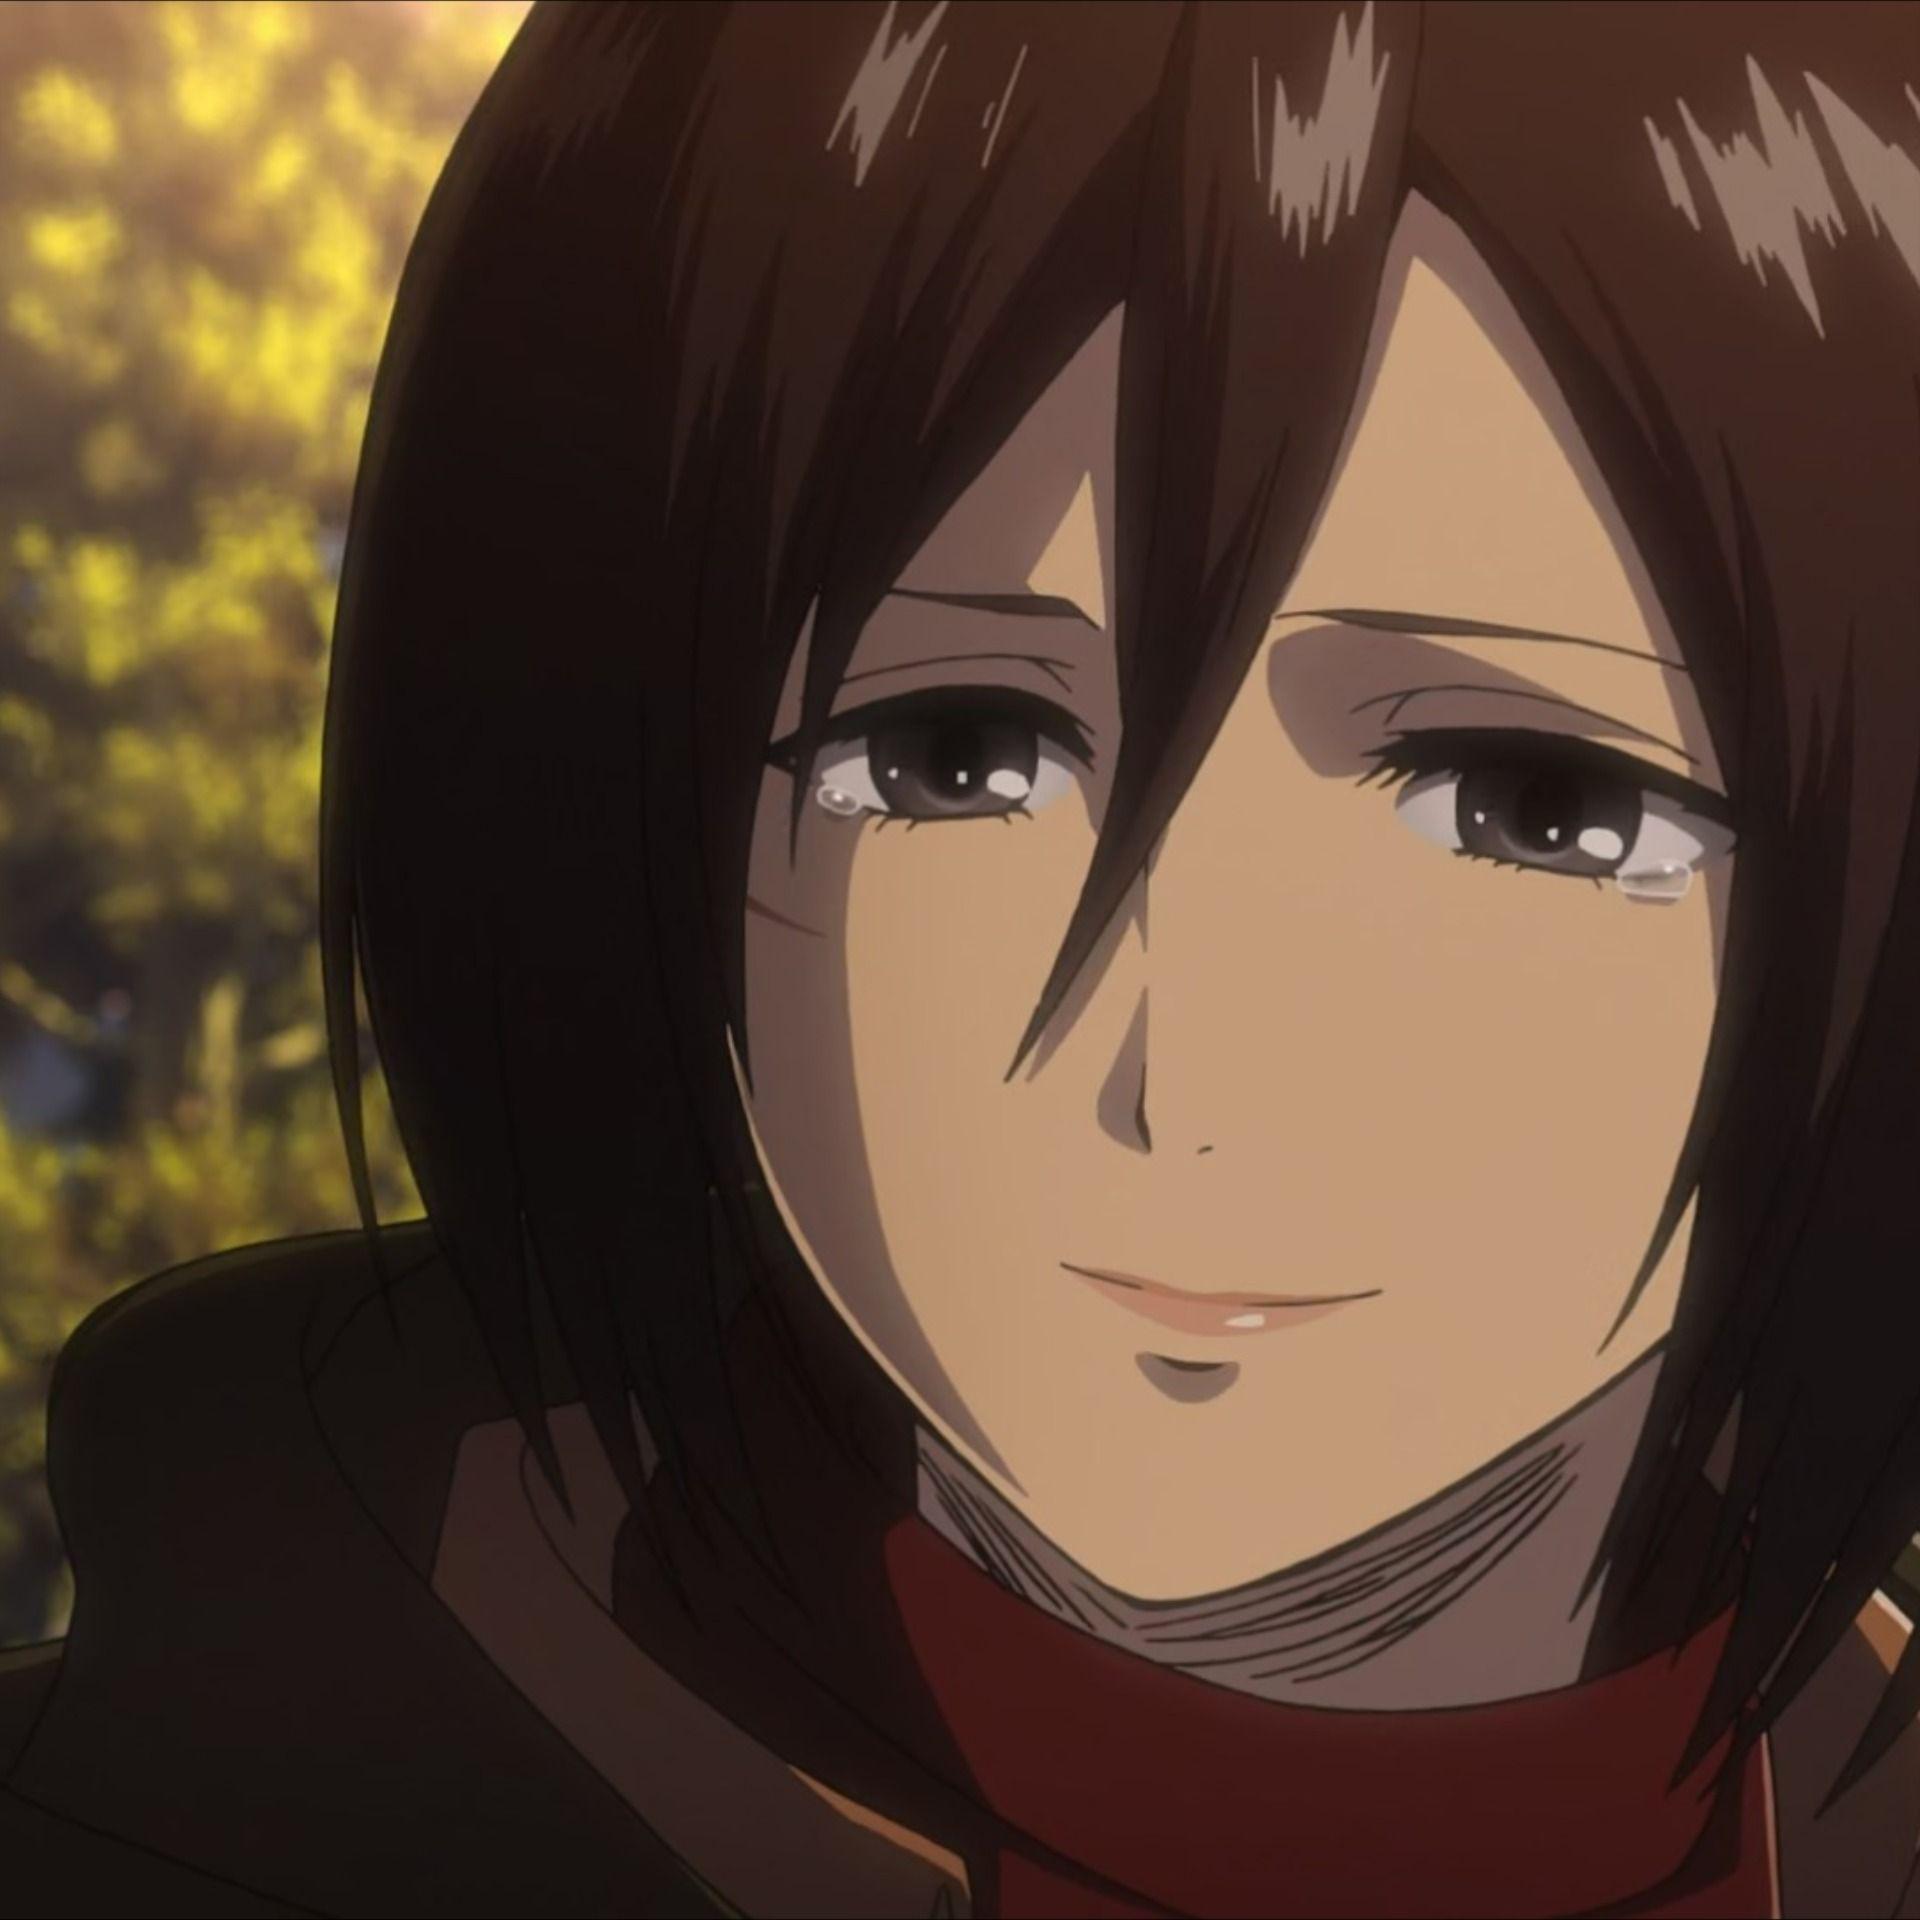 MIKASA IN SEASONS in 2020 Mikasa, Anime, Anime icons